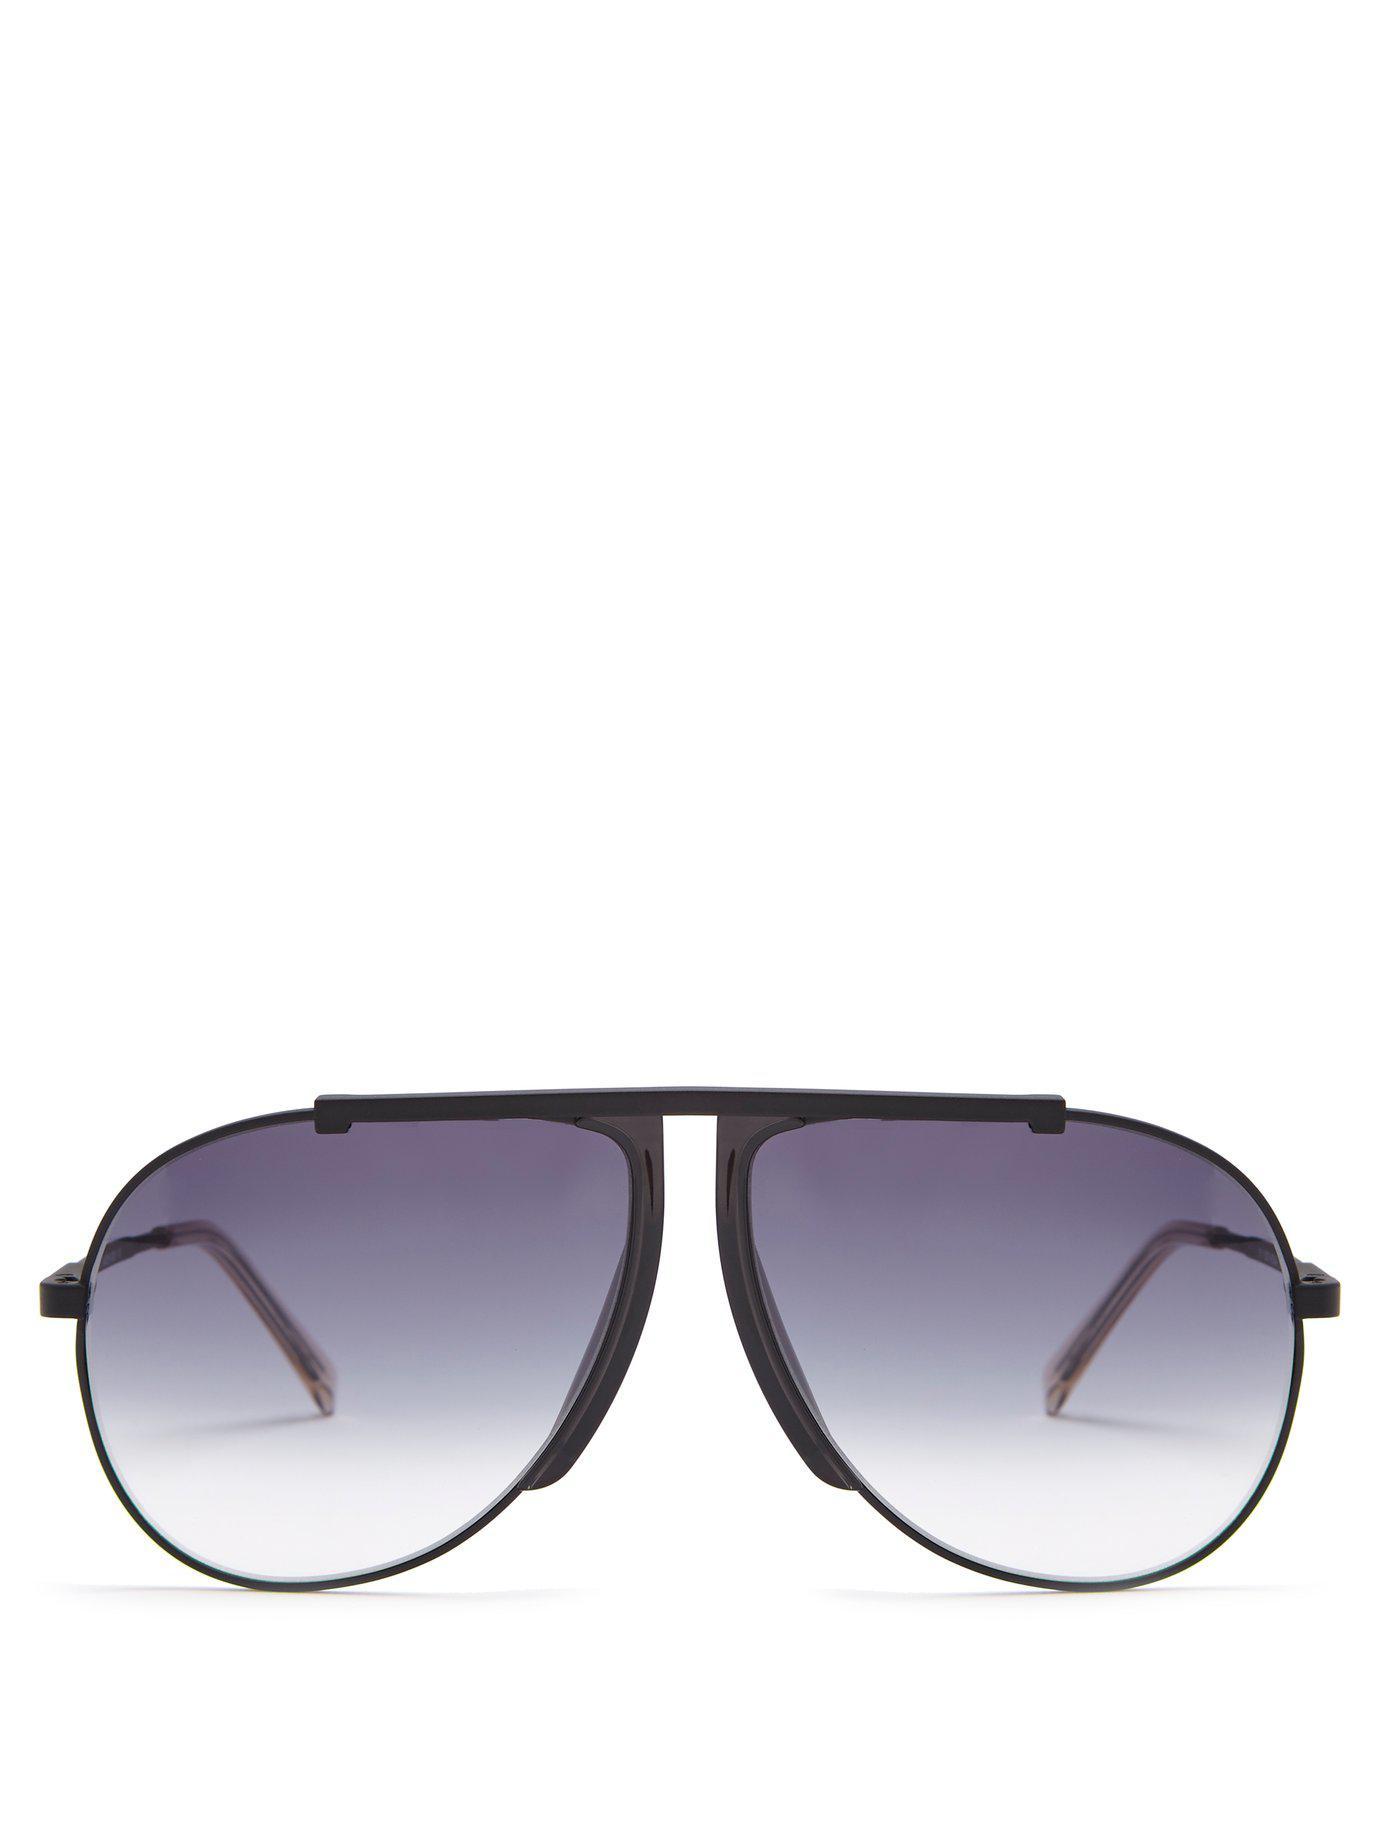 72eafa6470 Lyst - Céline Aviator Frame Sunglasses in Black